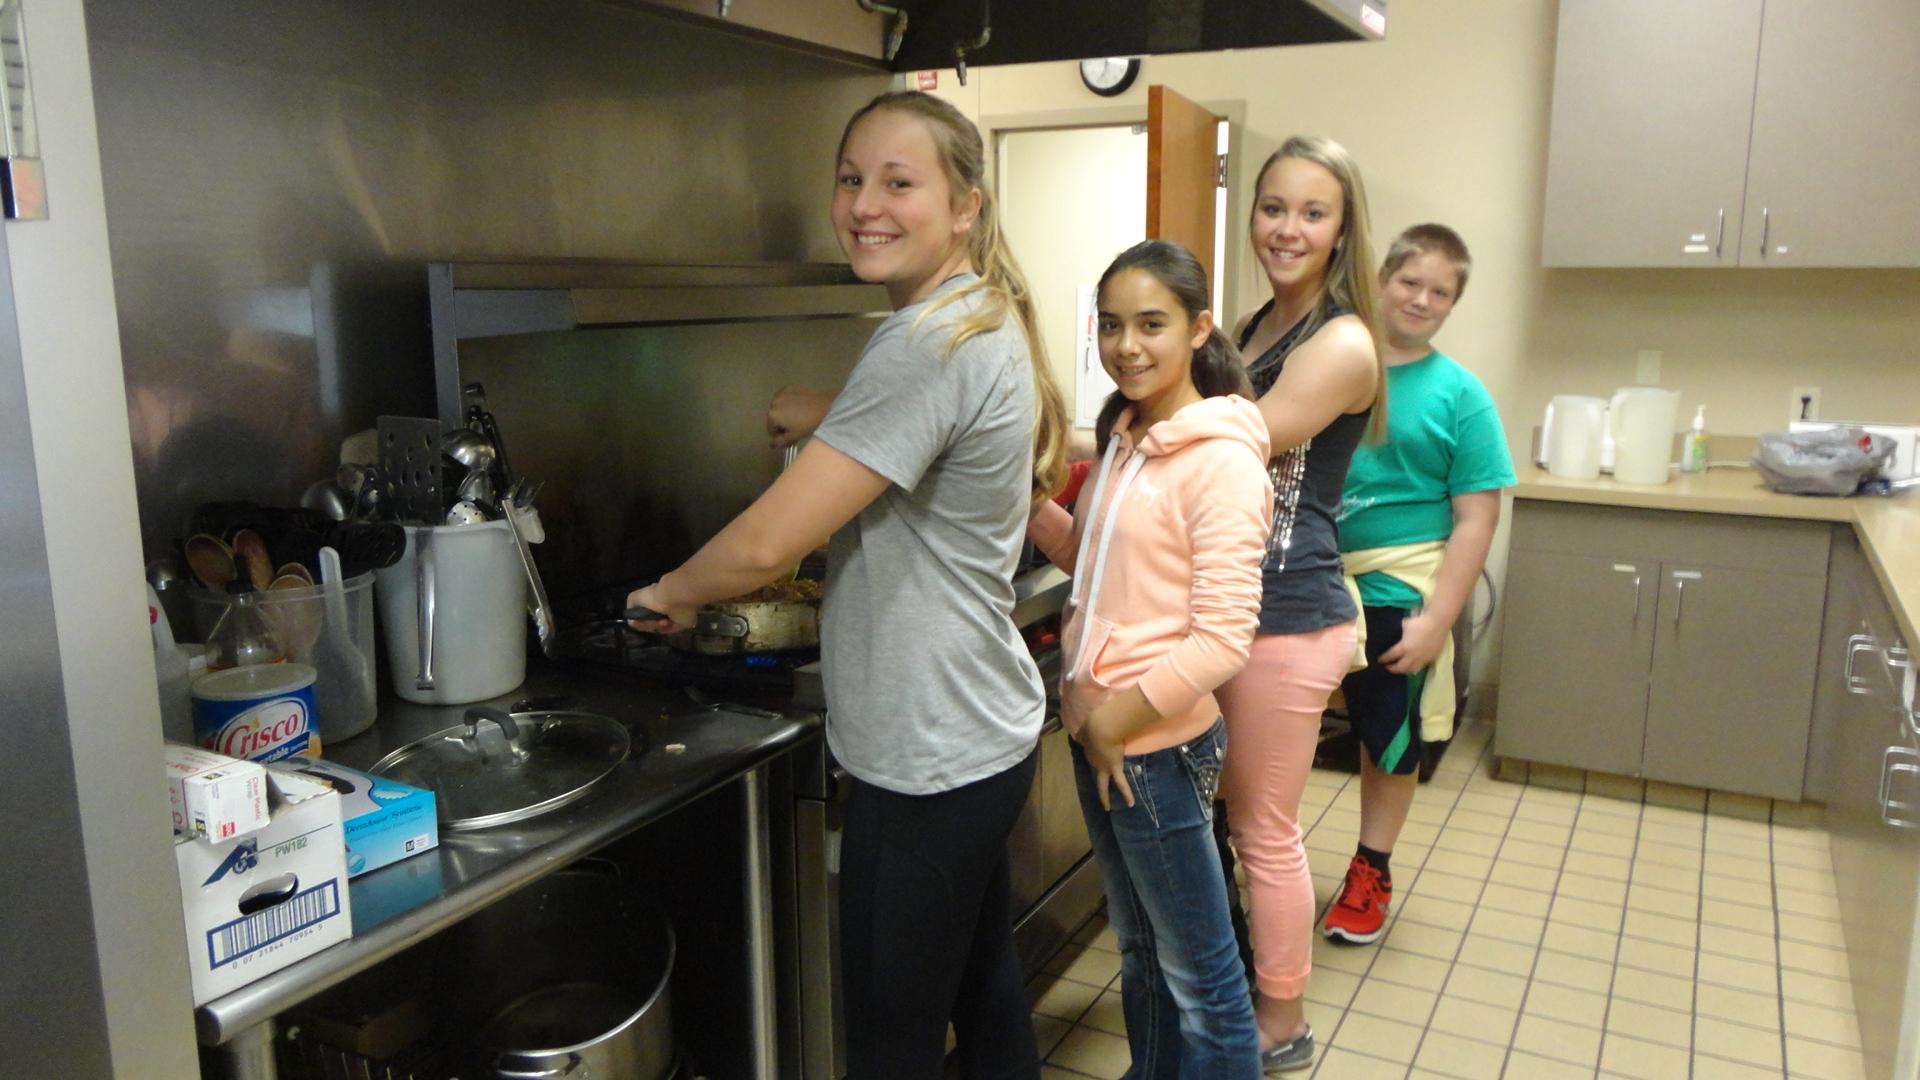 Volunteers Helping in Kitchen